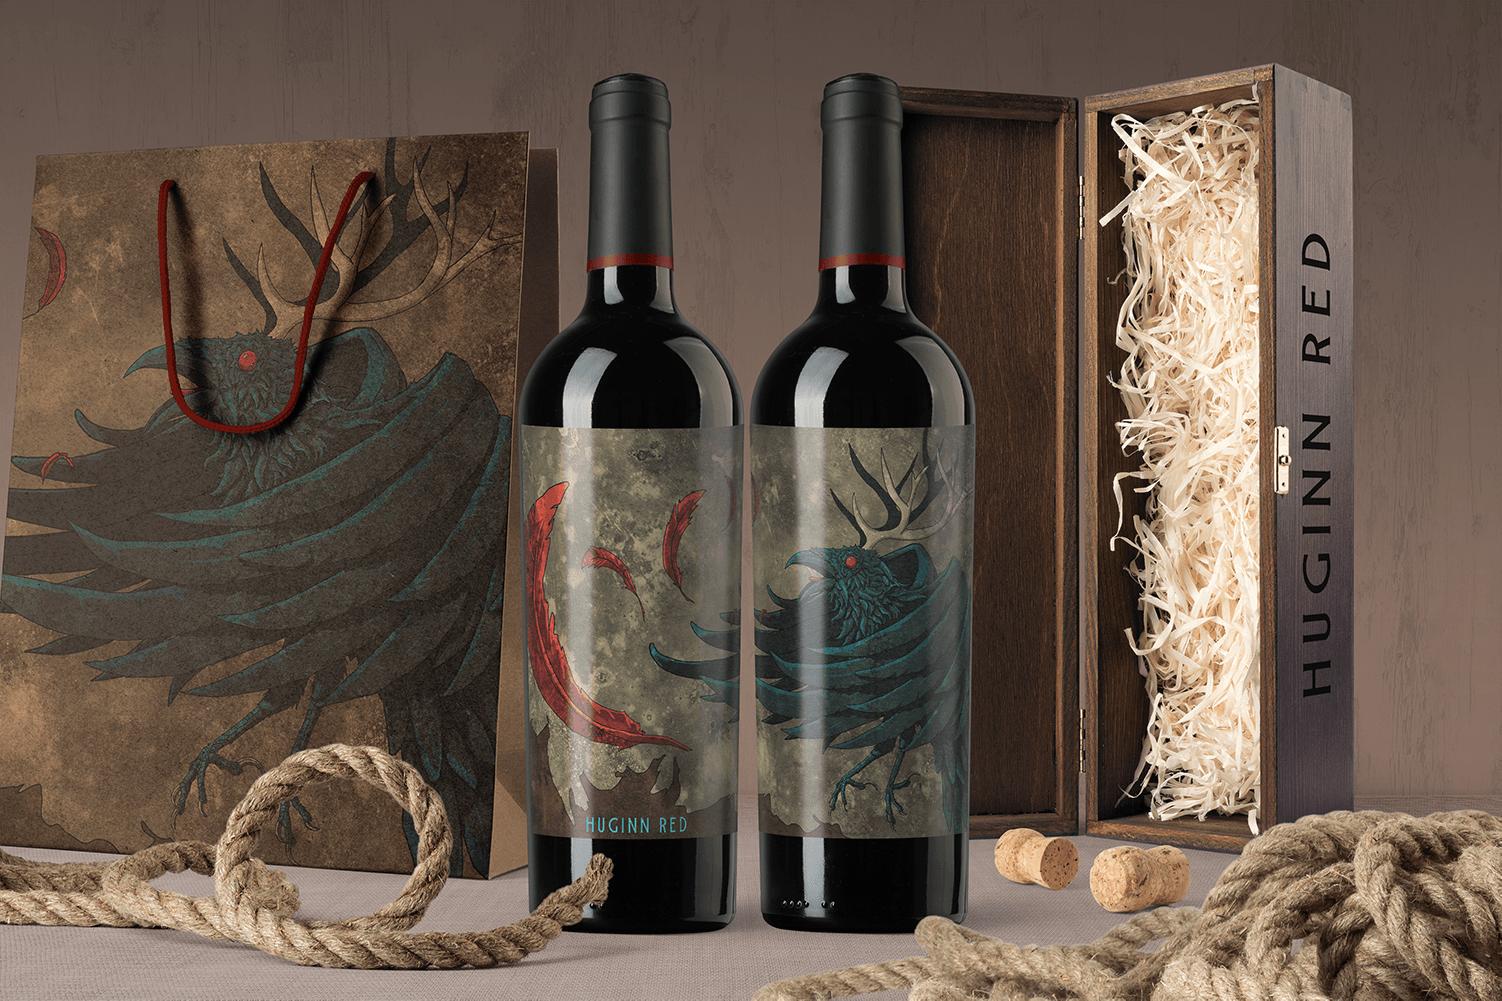 Huginn Red Wine-front-packaging-scene_mockup 1.png